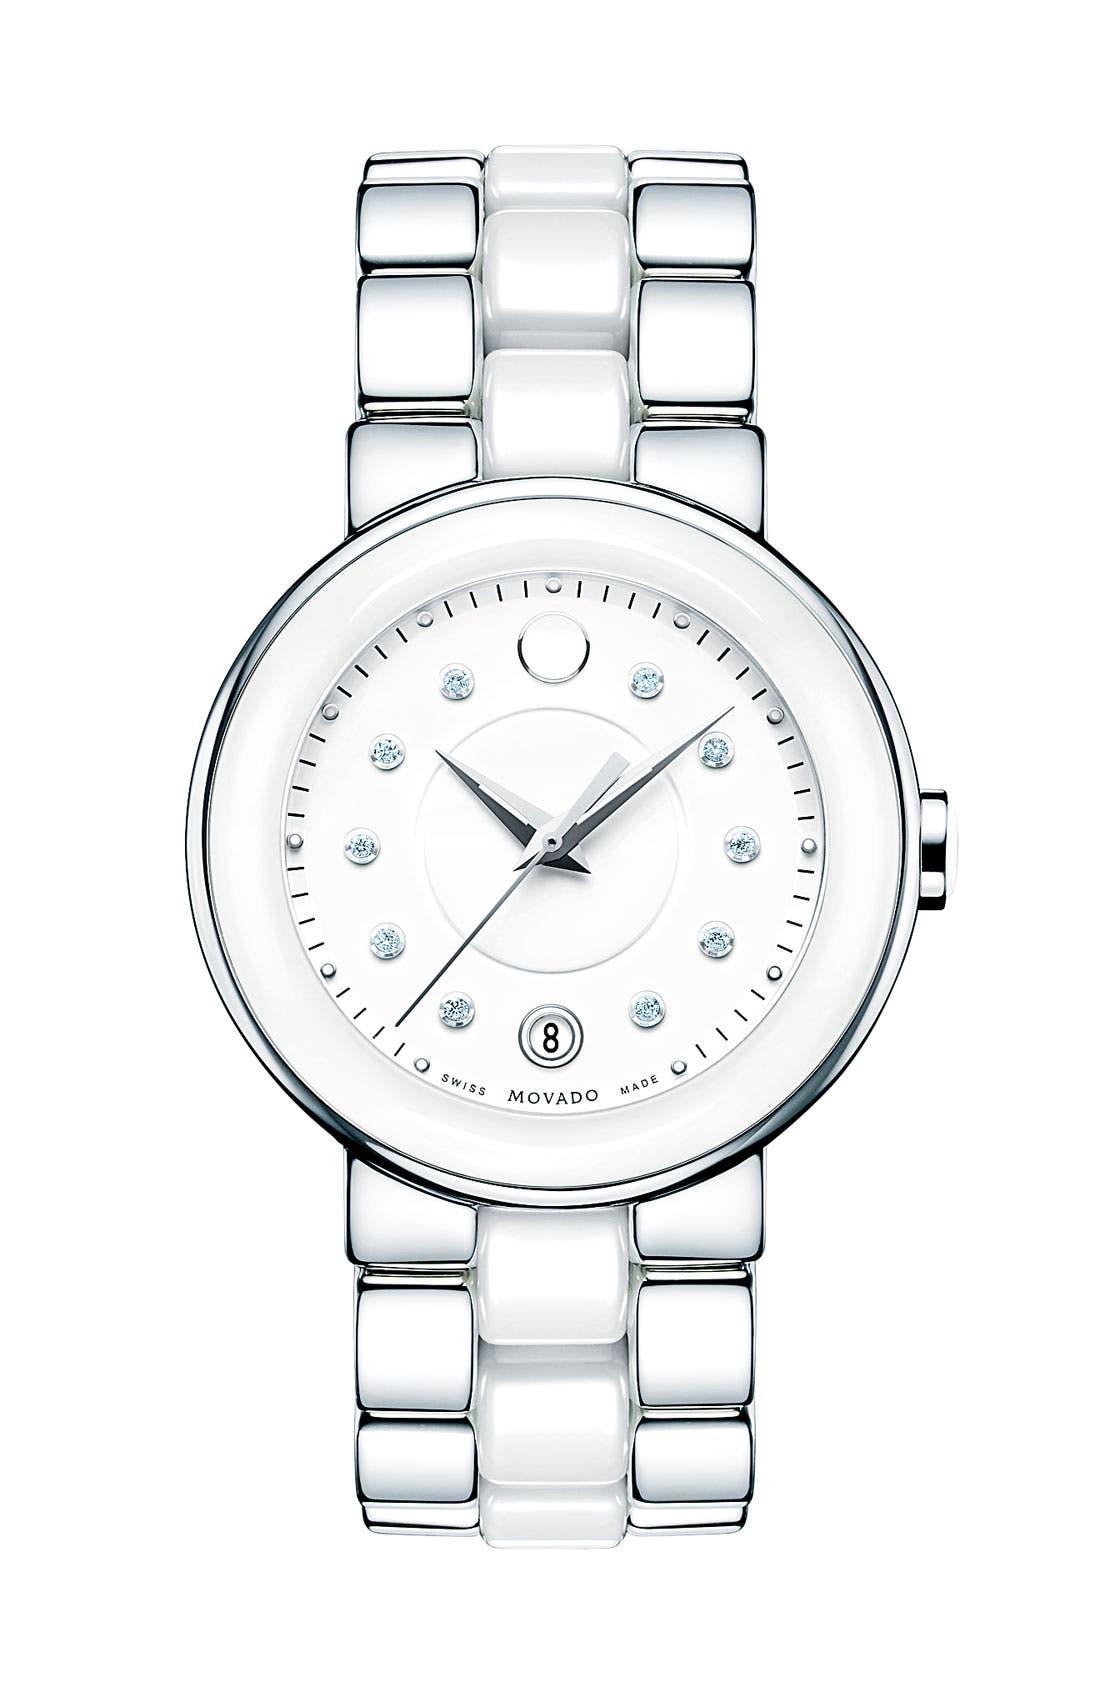 Main Image - Movado 'Cerena' Diamond Dial Ceramic & Steel Watch, 34mm